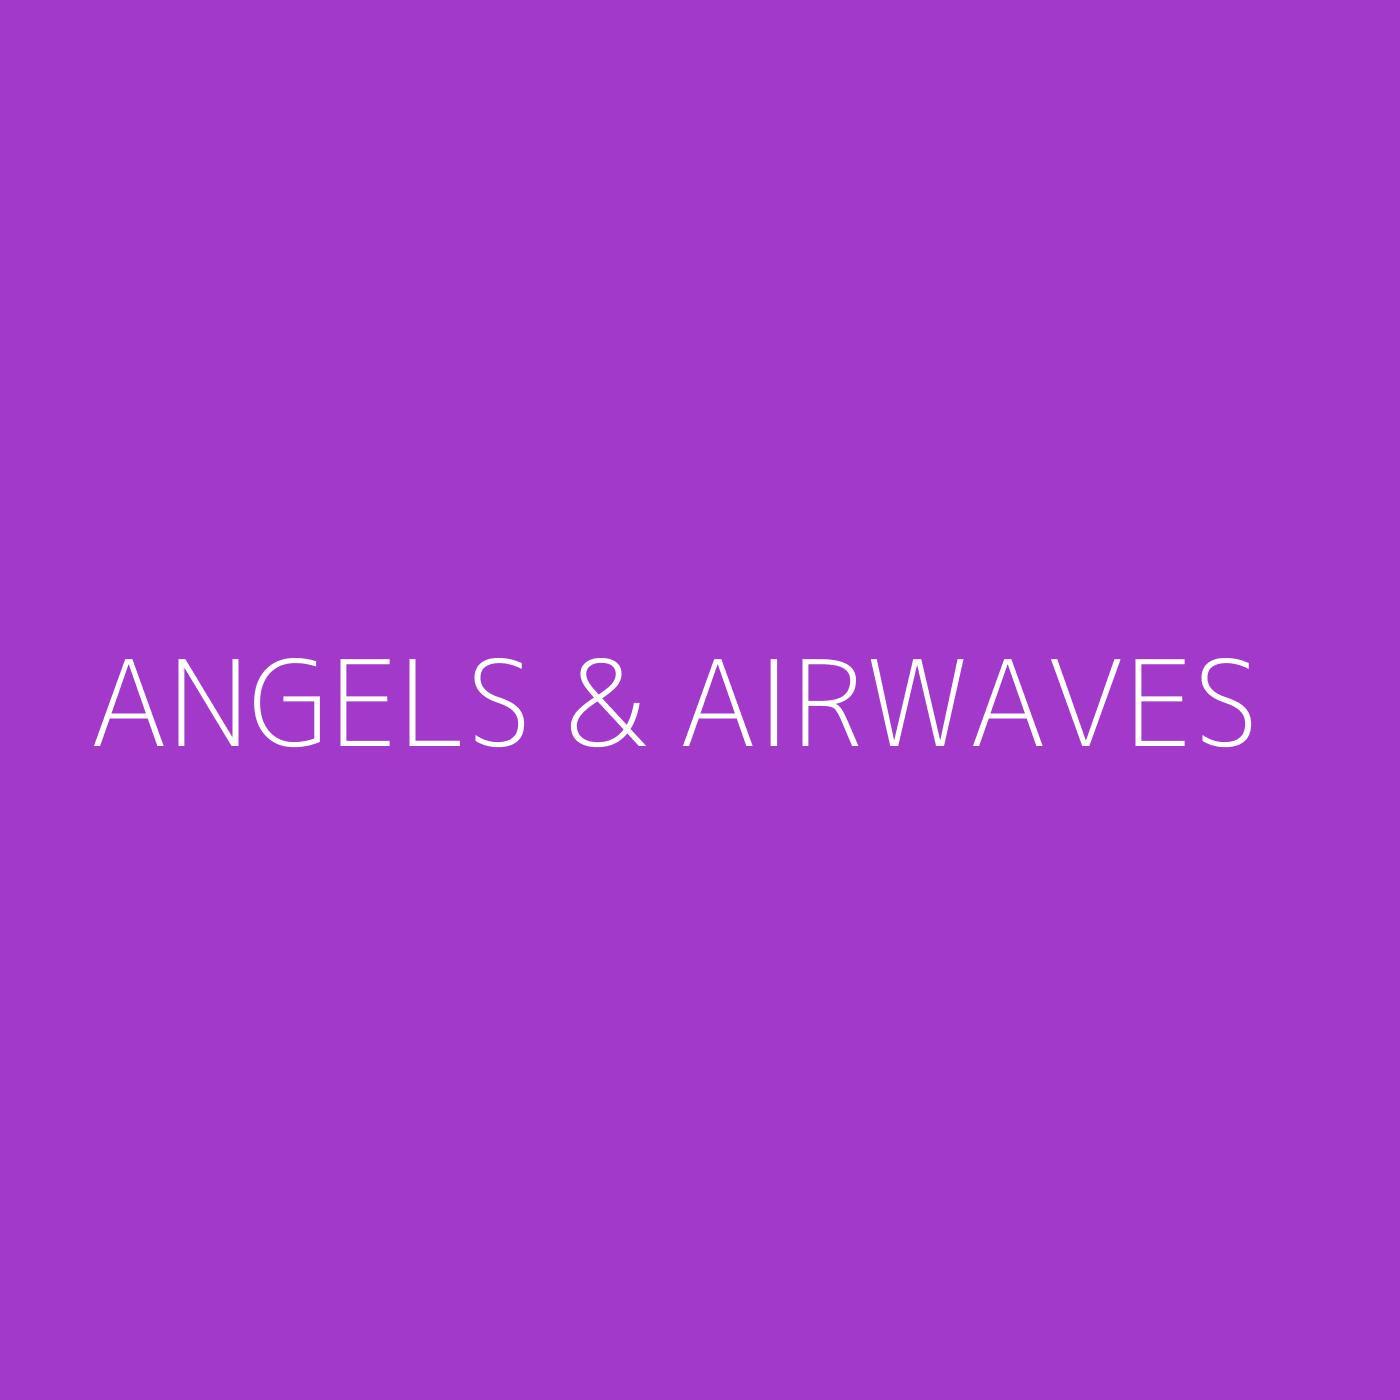 Angels & Airwaves Playlist Artwork